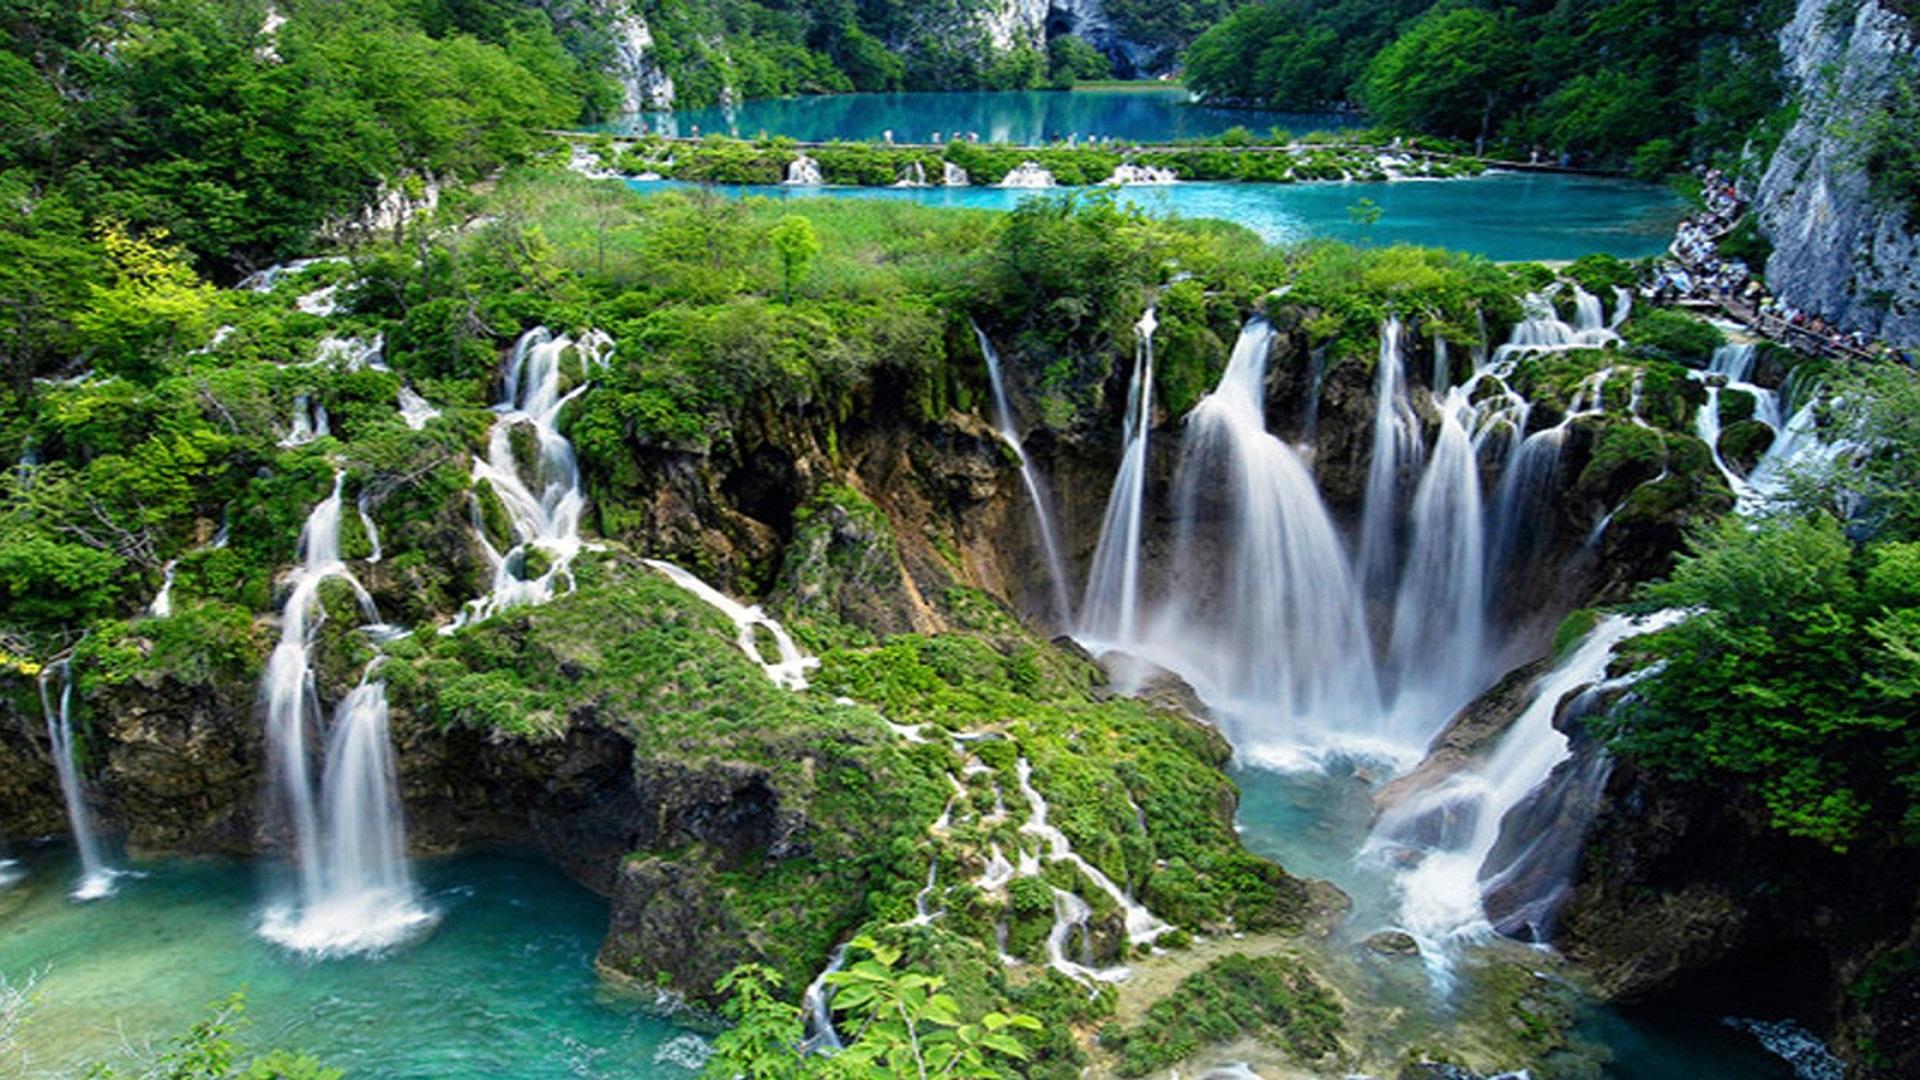 Beautiful Waterfall Nature Images